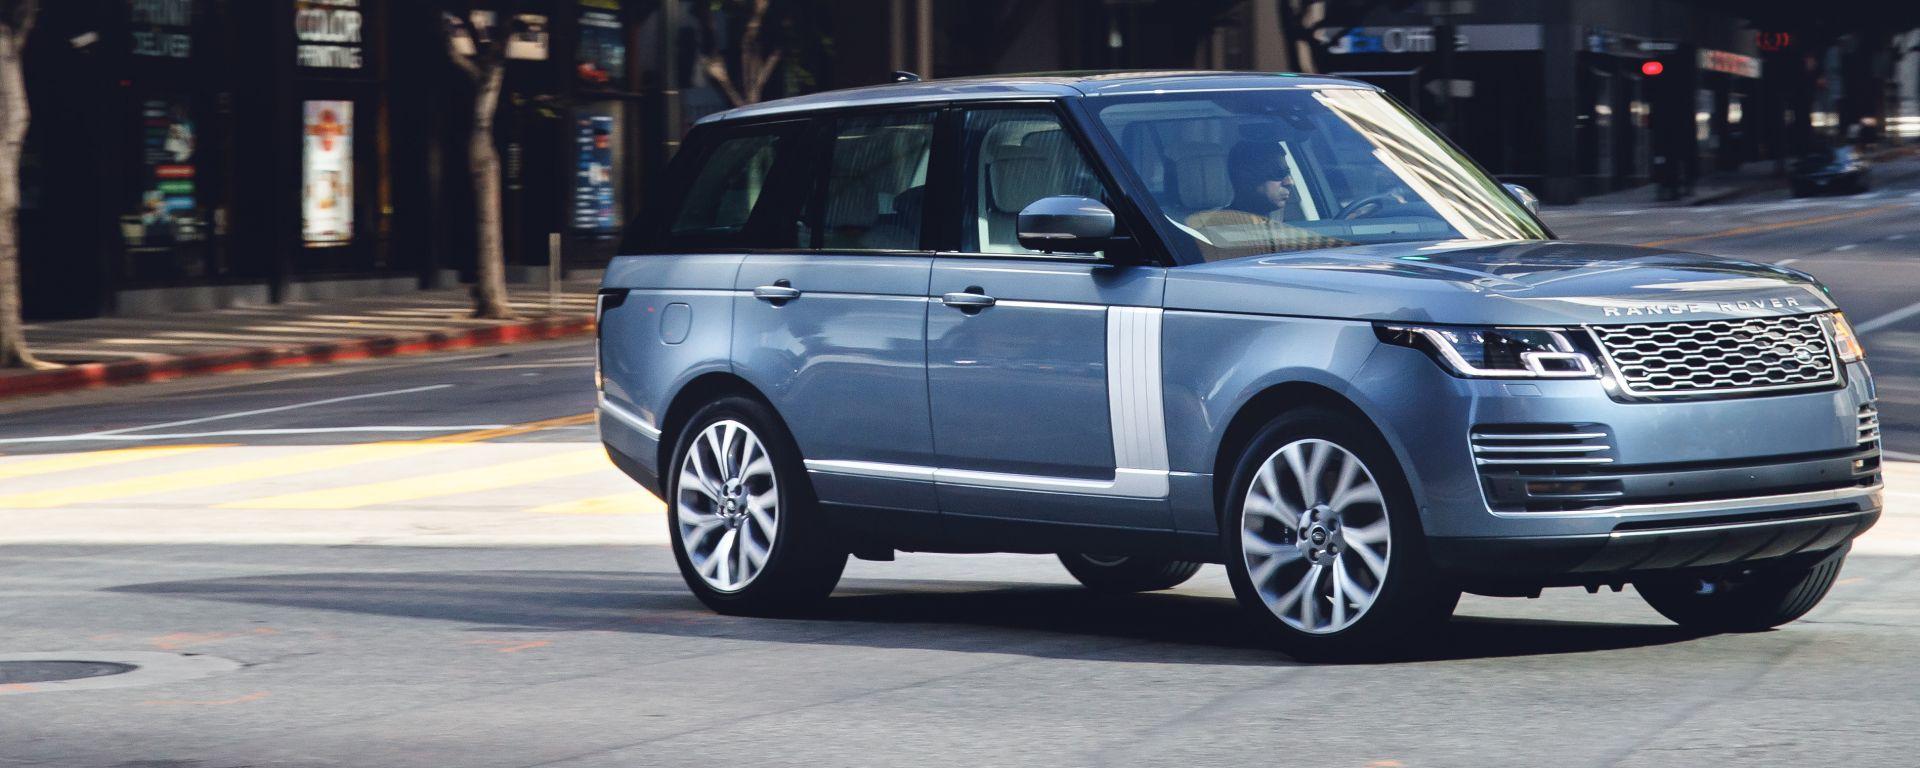 Range Rover e Range Rover Sport: in arrivo un nuovo Diesel mild-hybrid